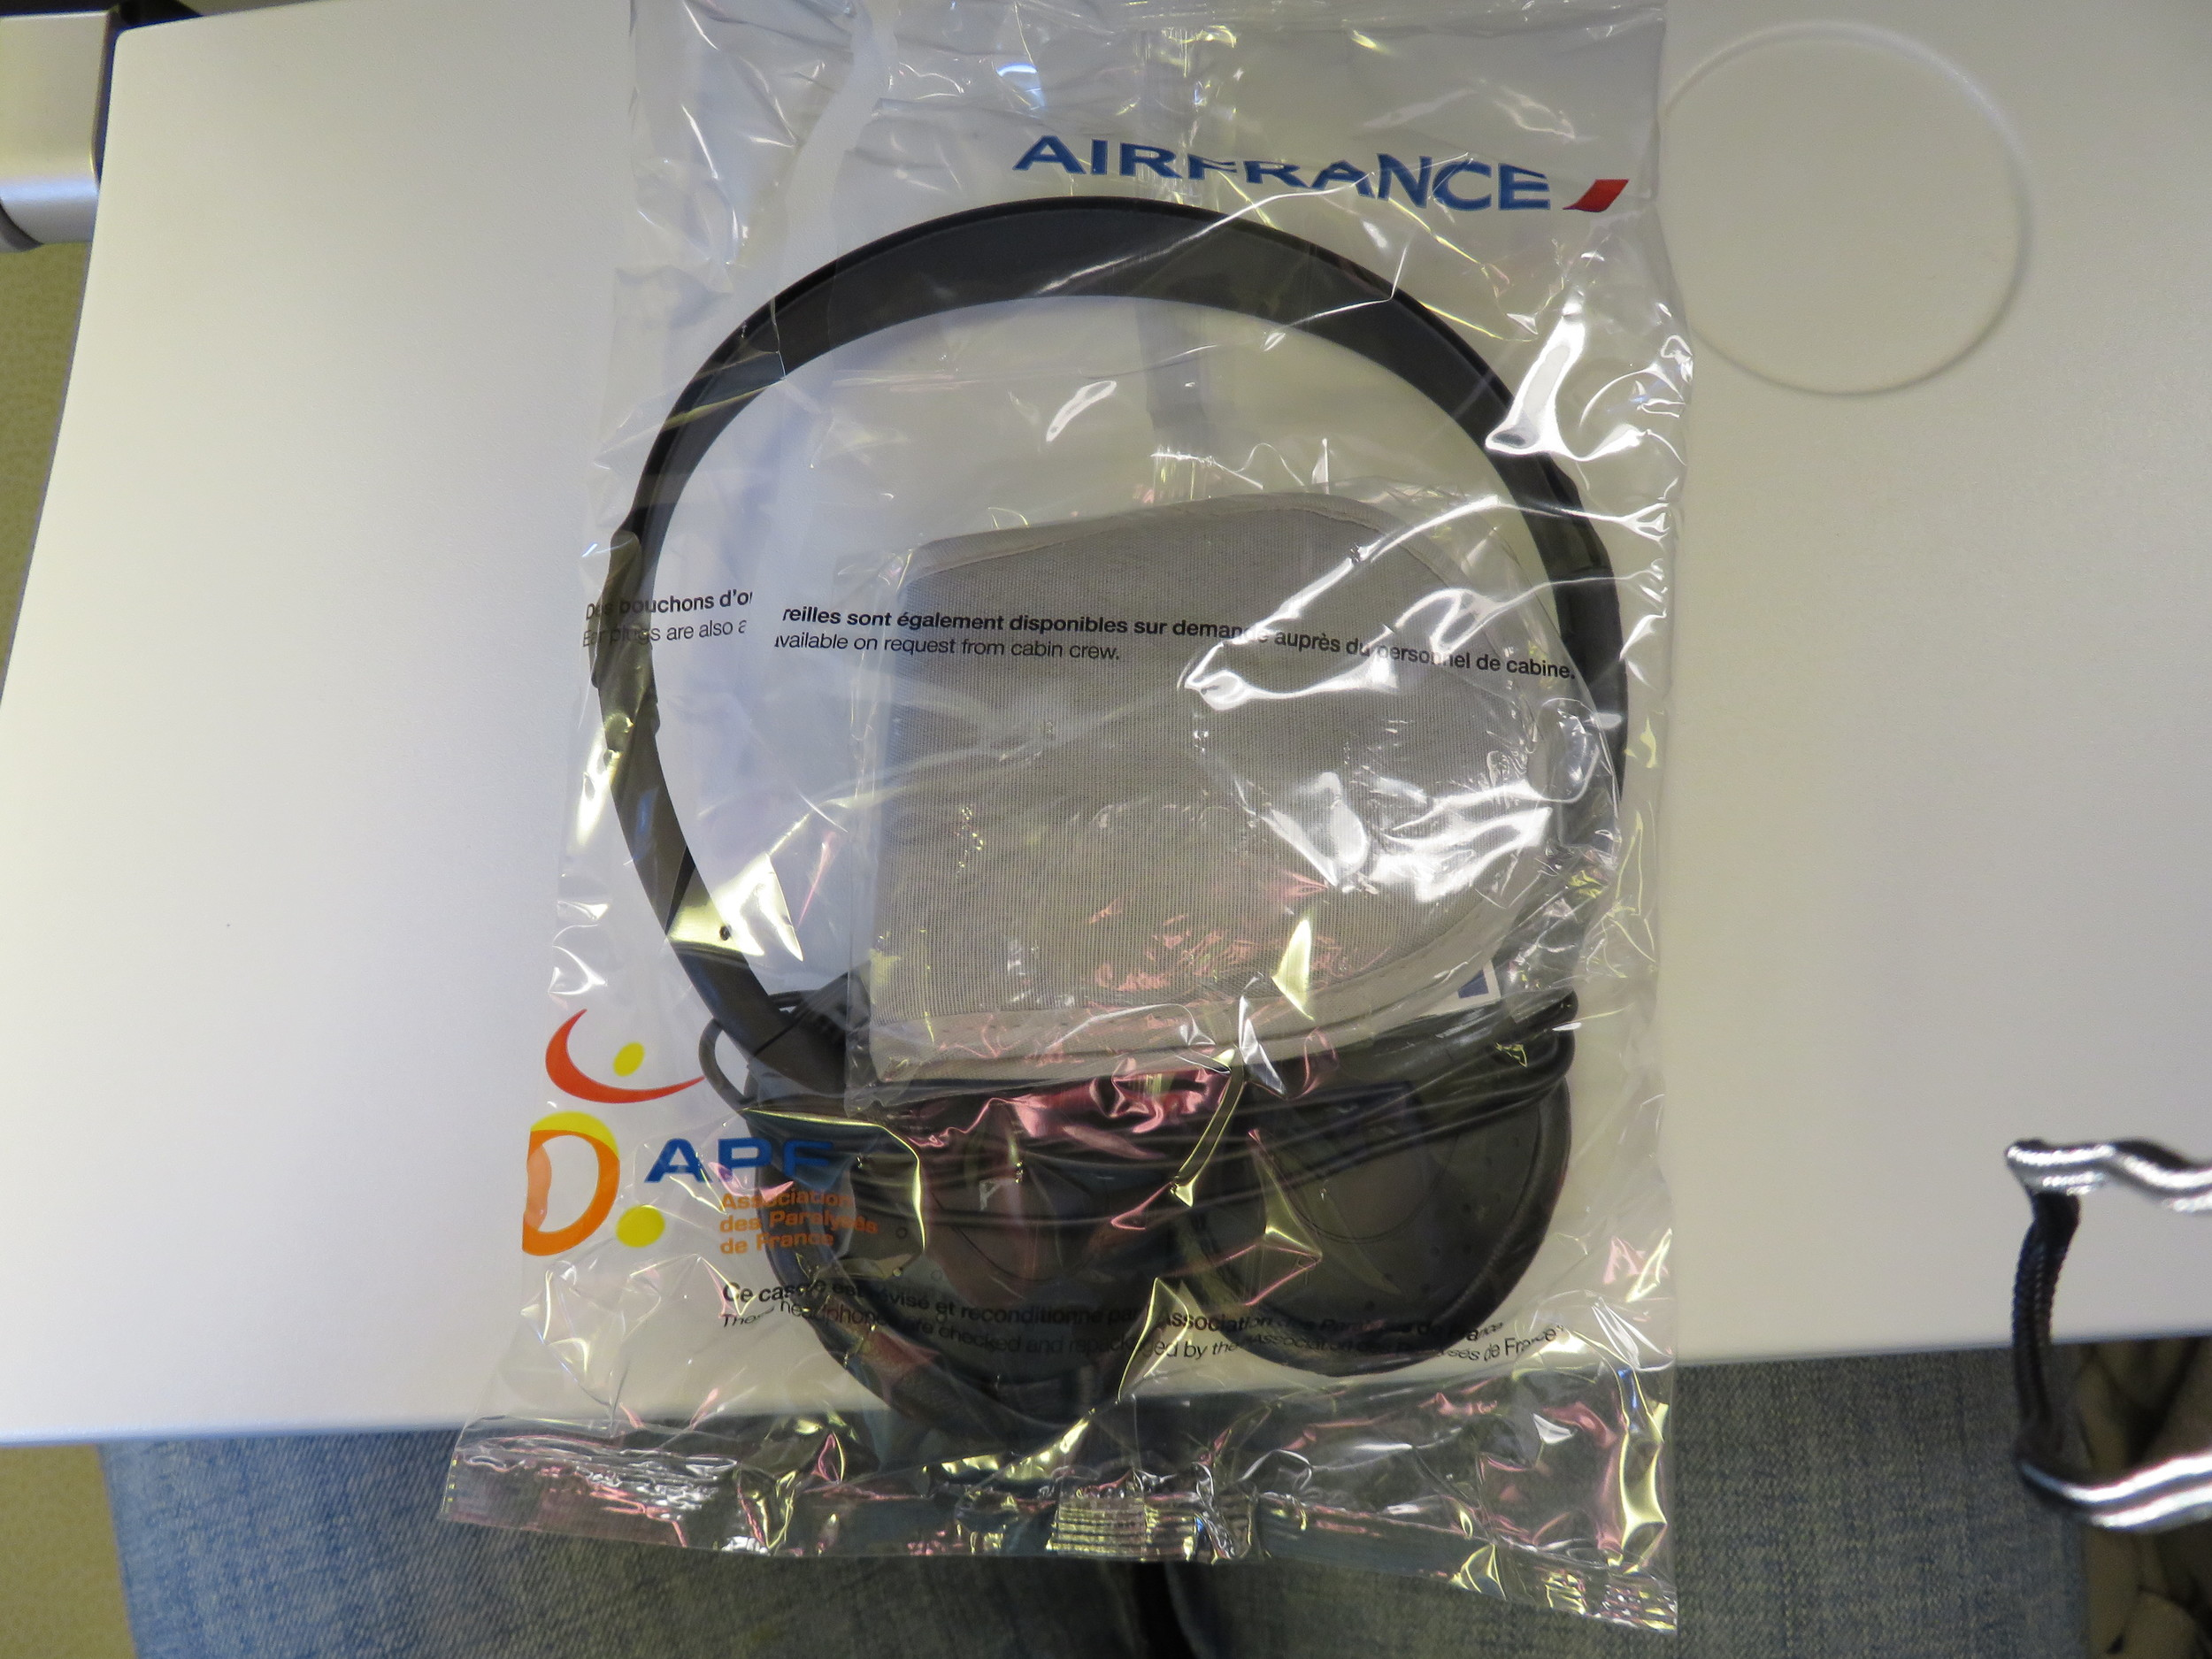 Air France headphones & sleeping mask